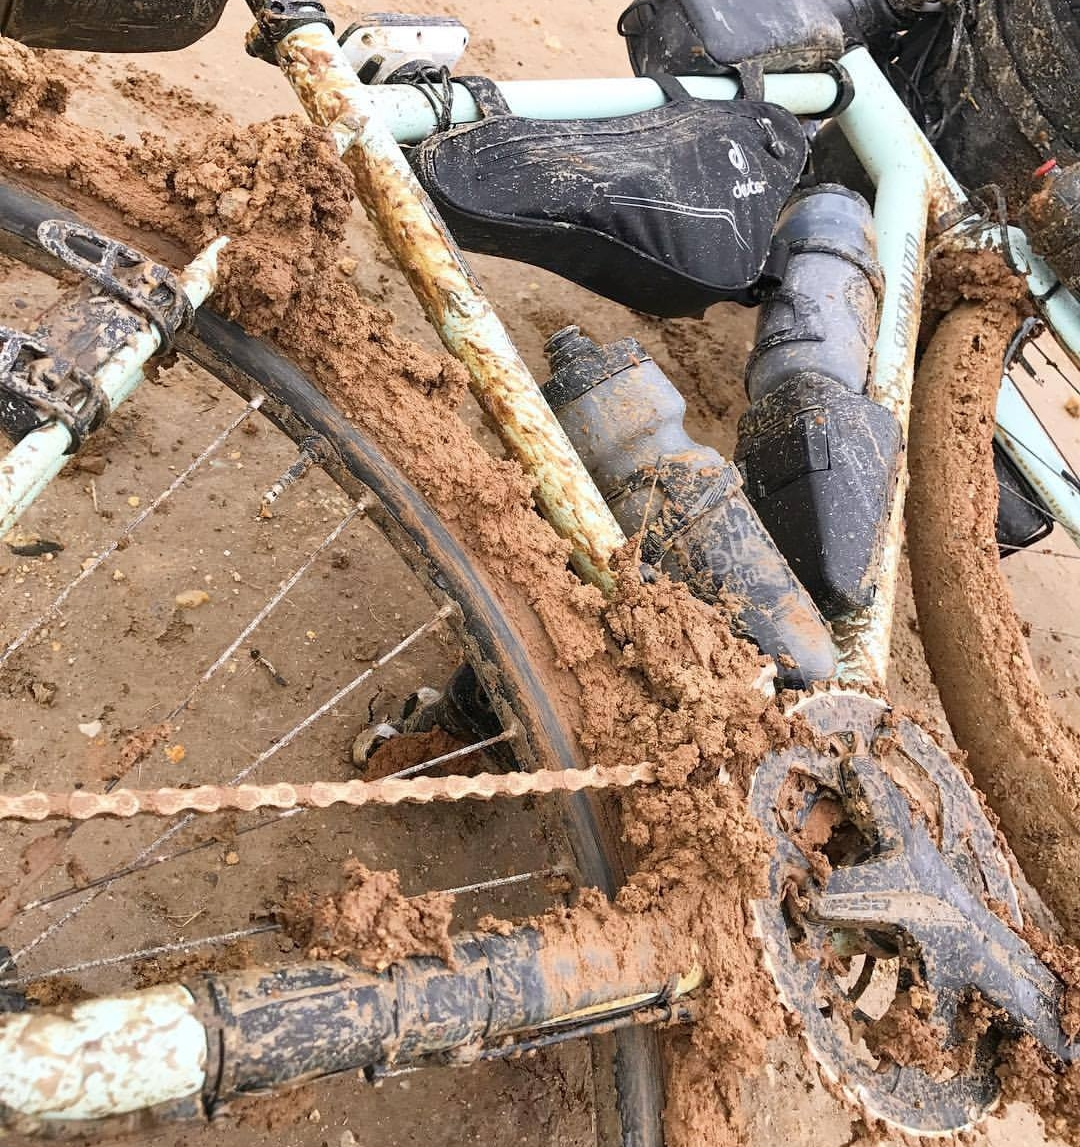 Photo and rekt bike - Dave Edwards (@withallihaveblog)